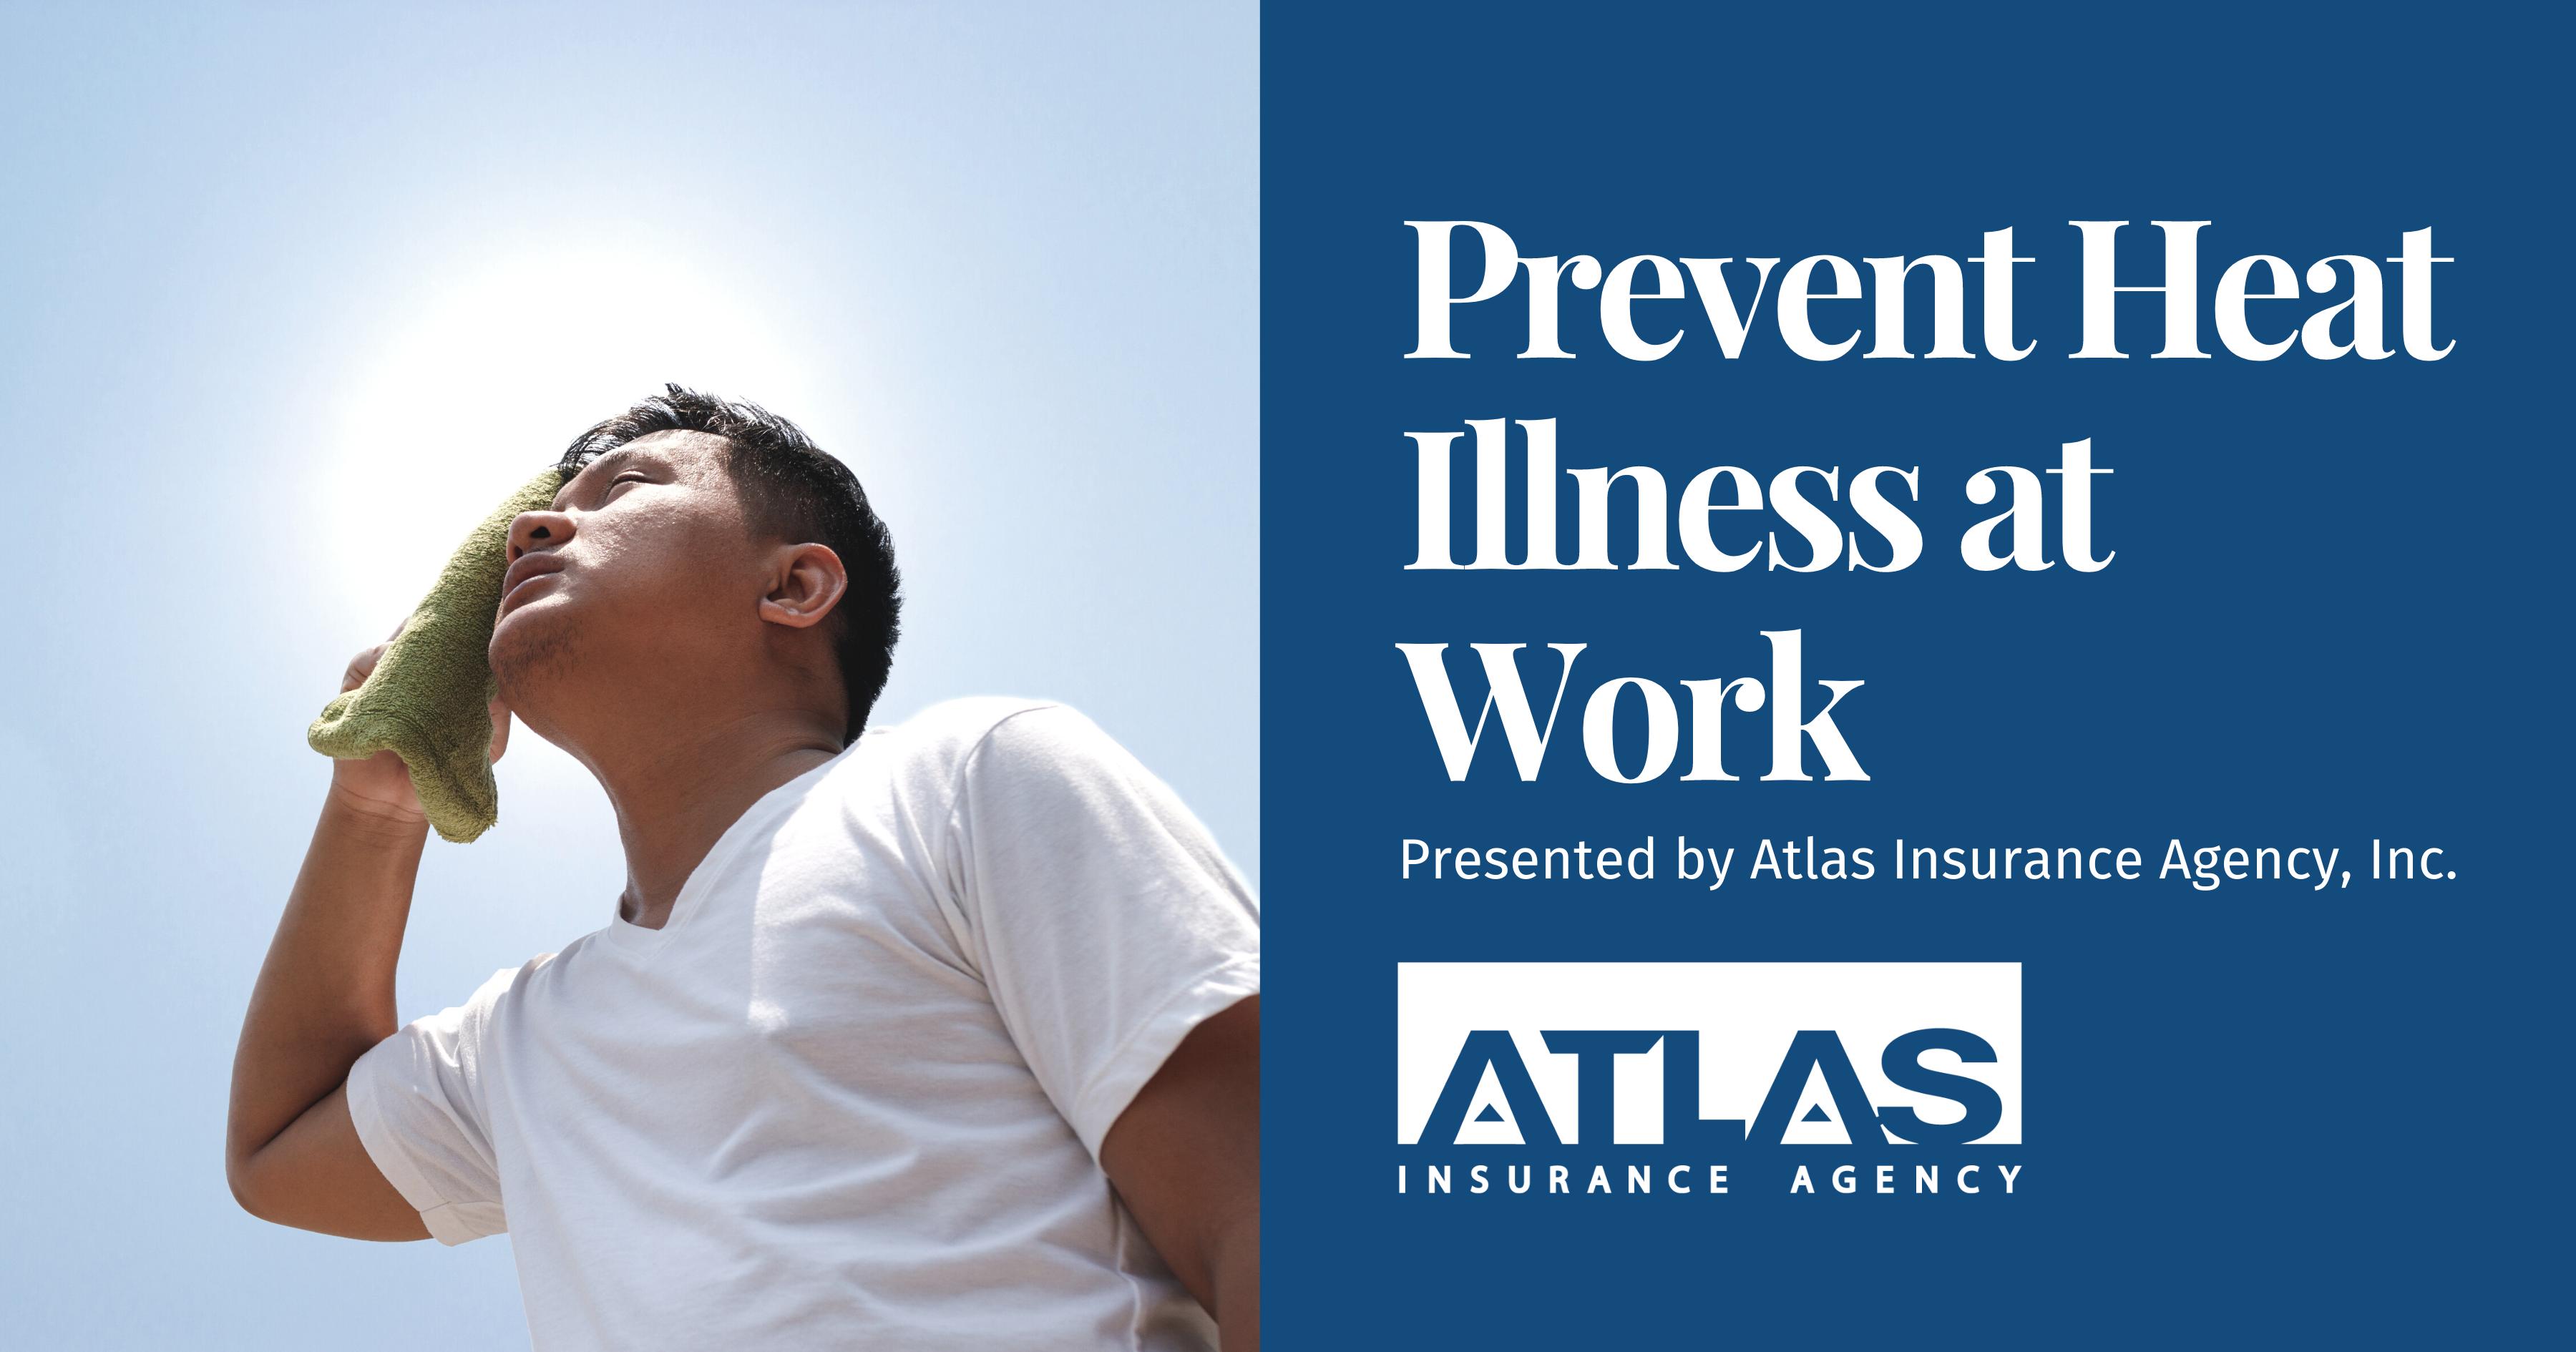 Prevent Heat Illness at Work